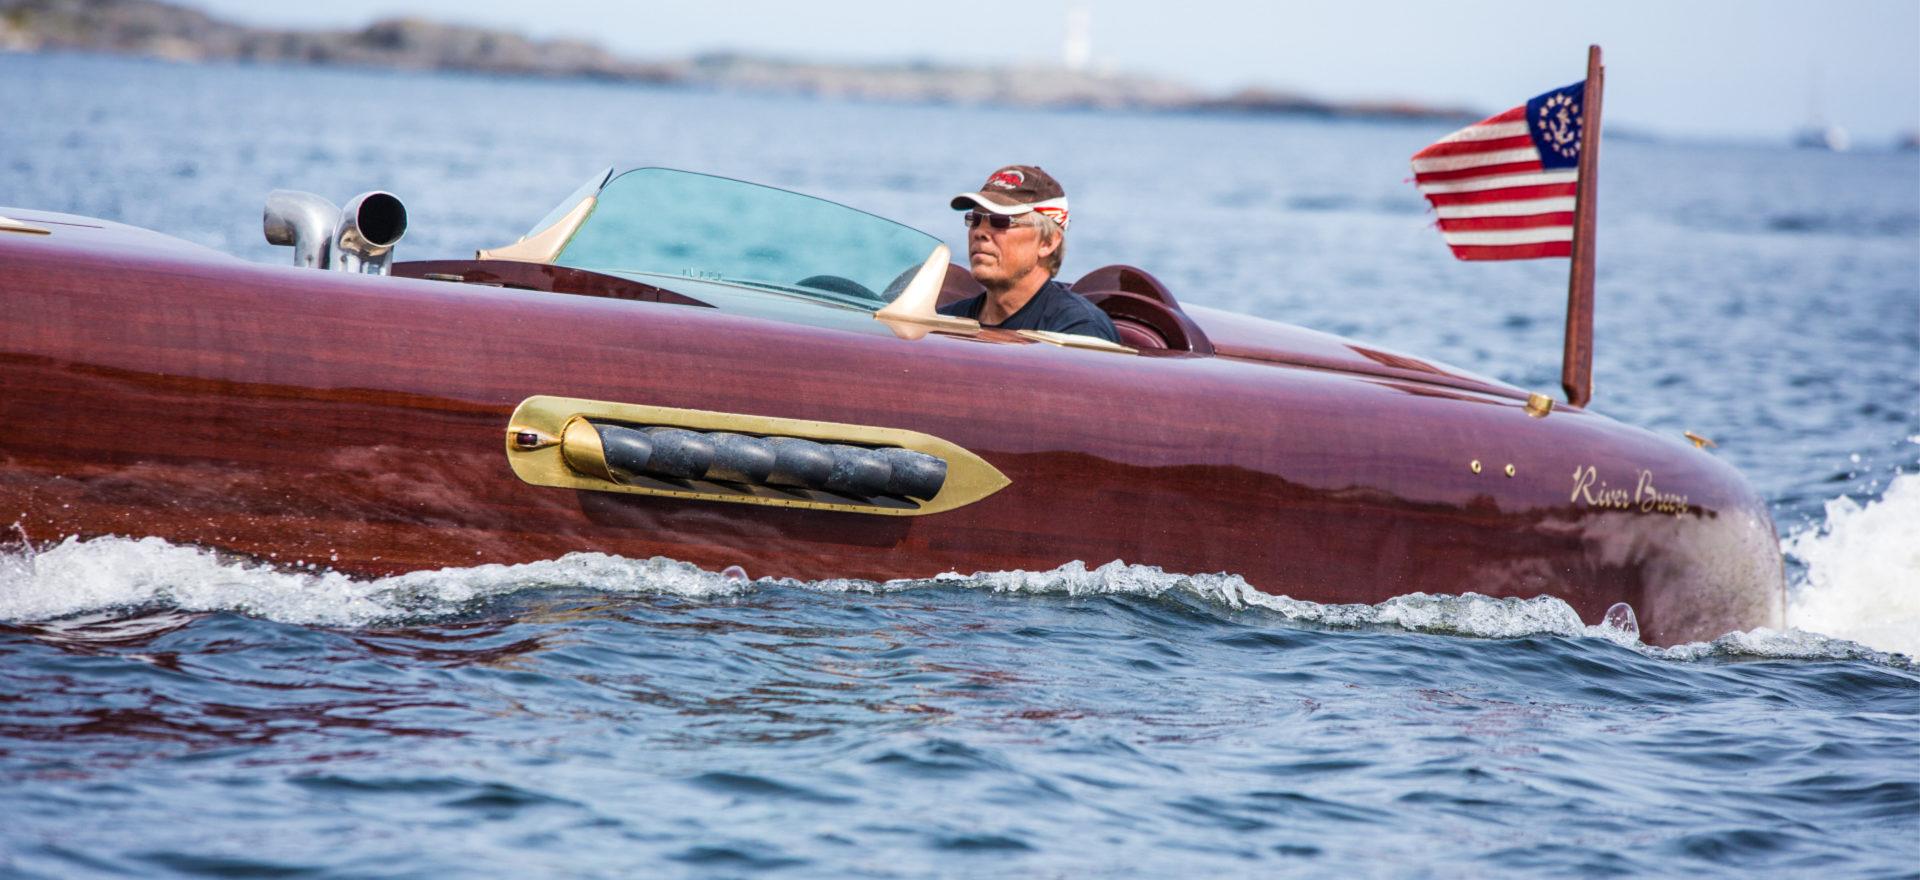 G5 boat_PRINT-7275